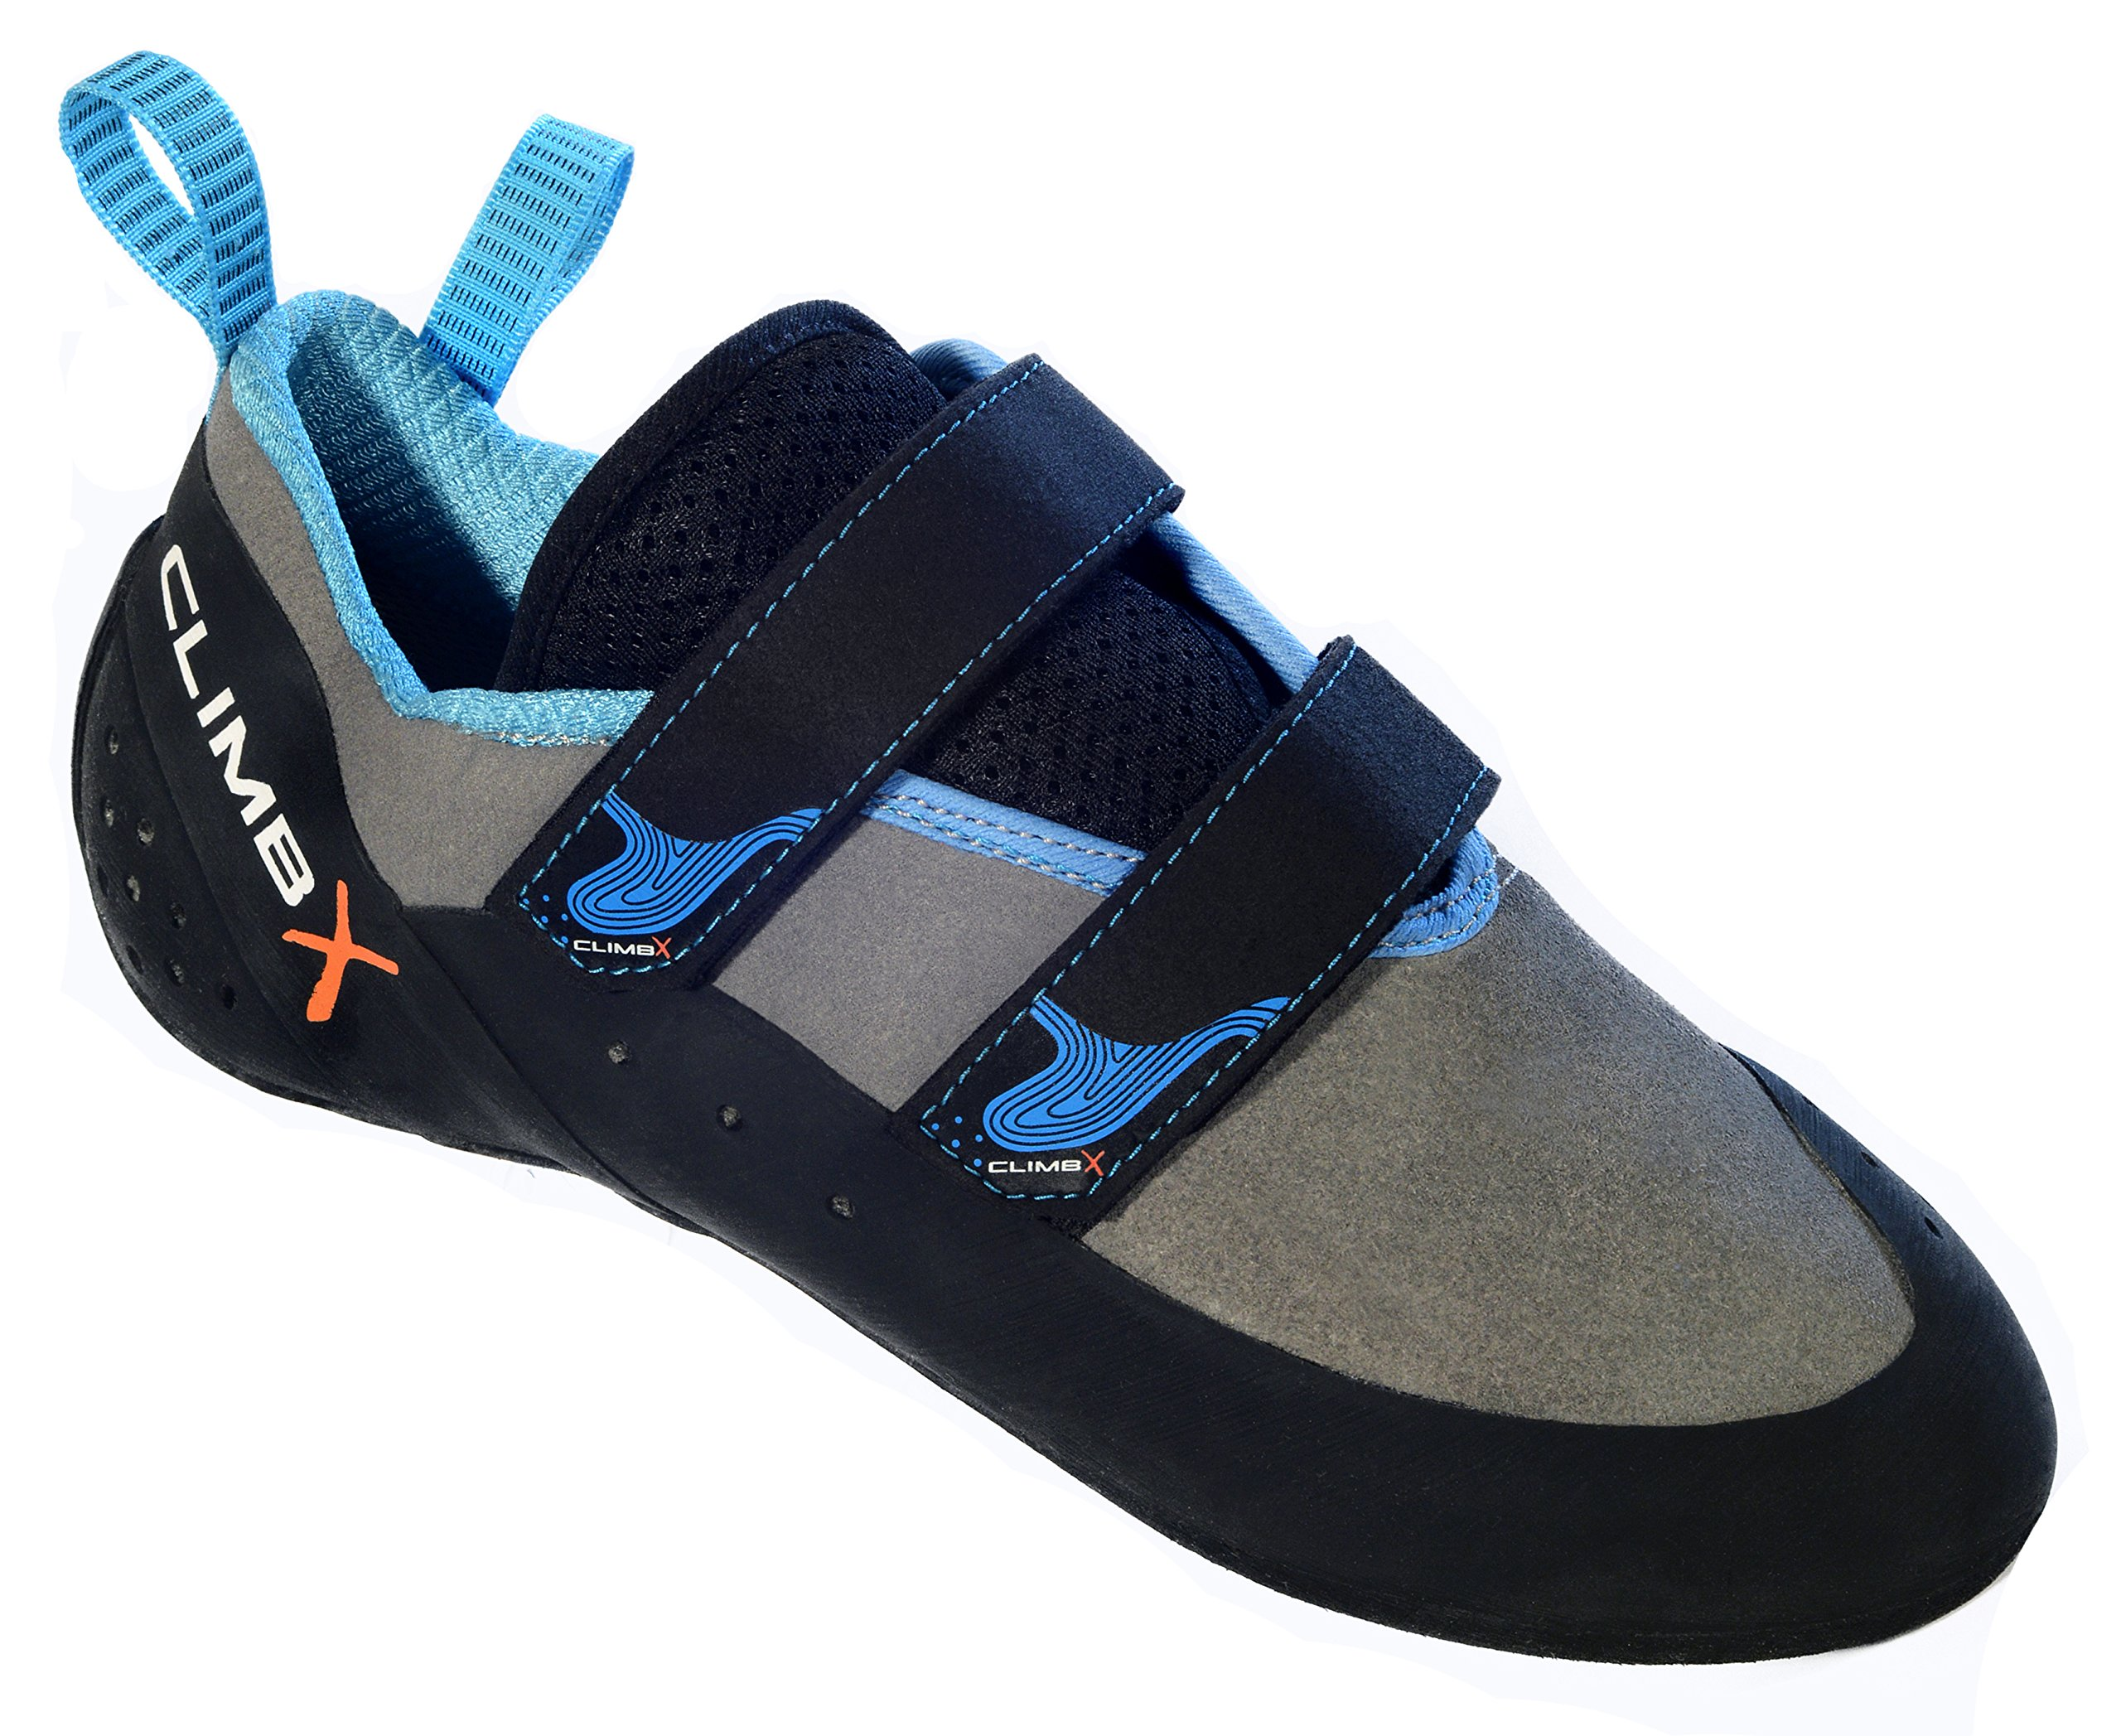 Climb X Rave Strap Climbing Shoe 2018 (10, Gray)